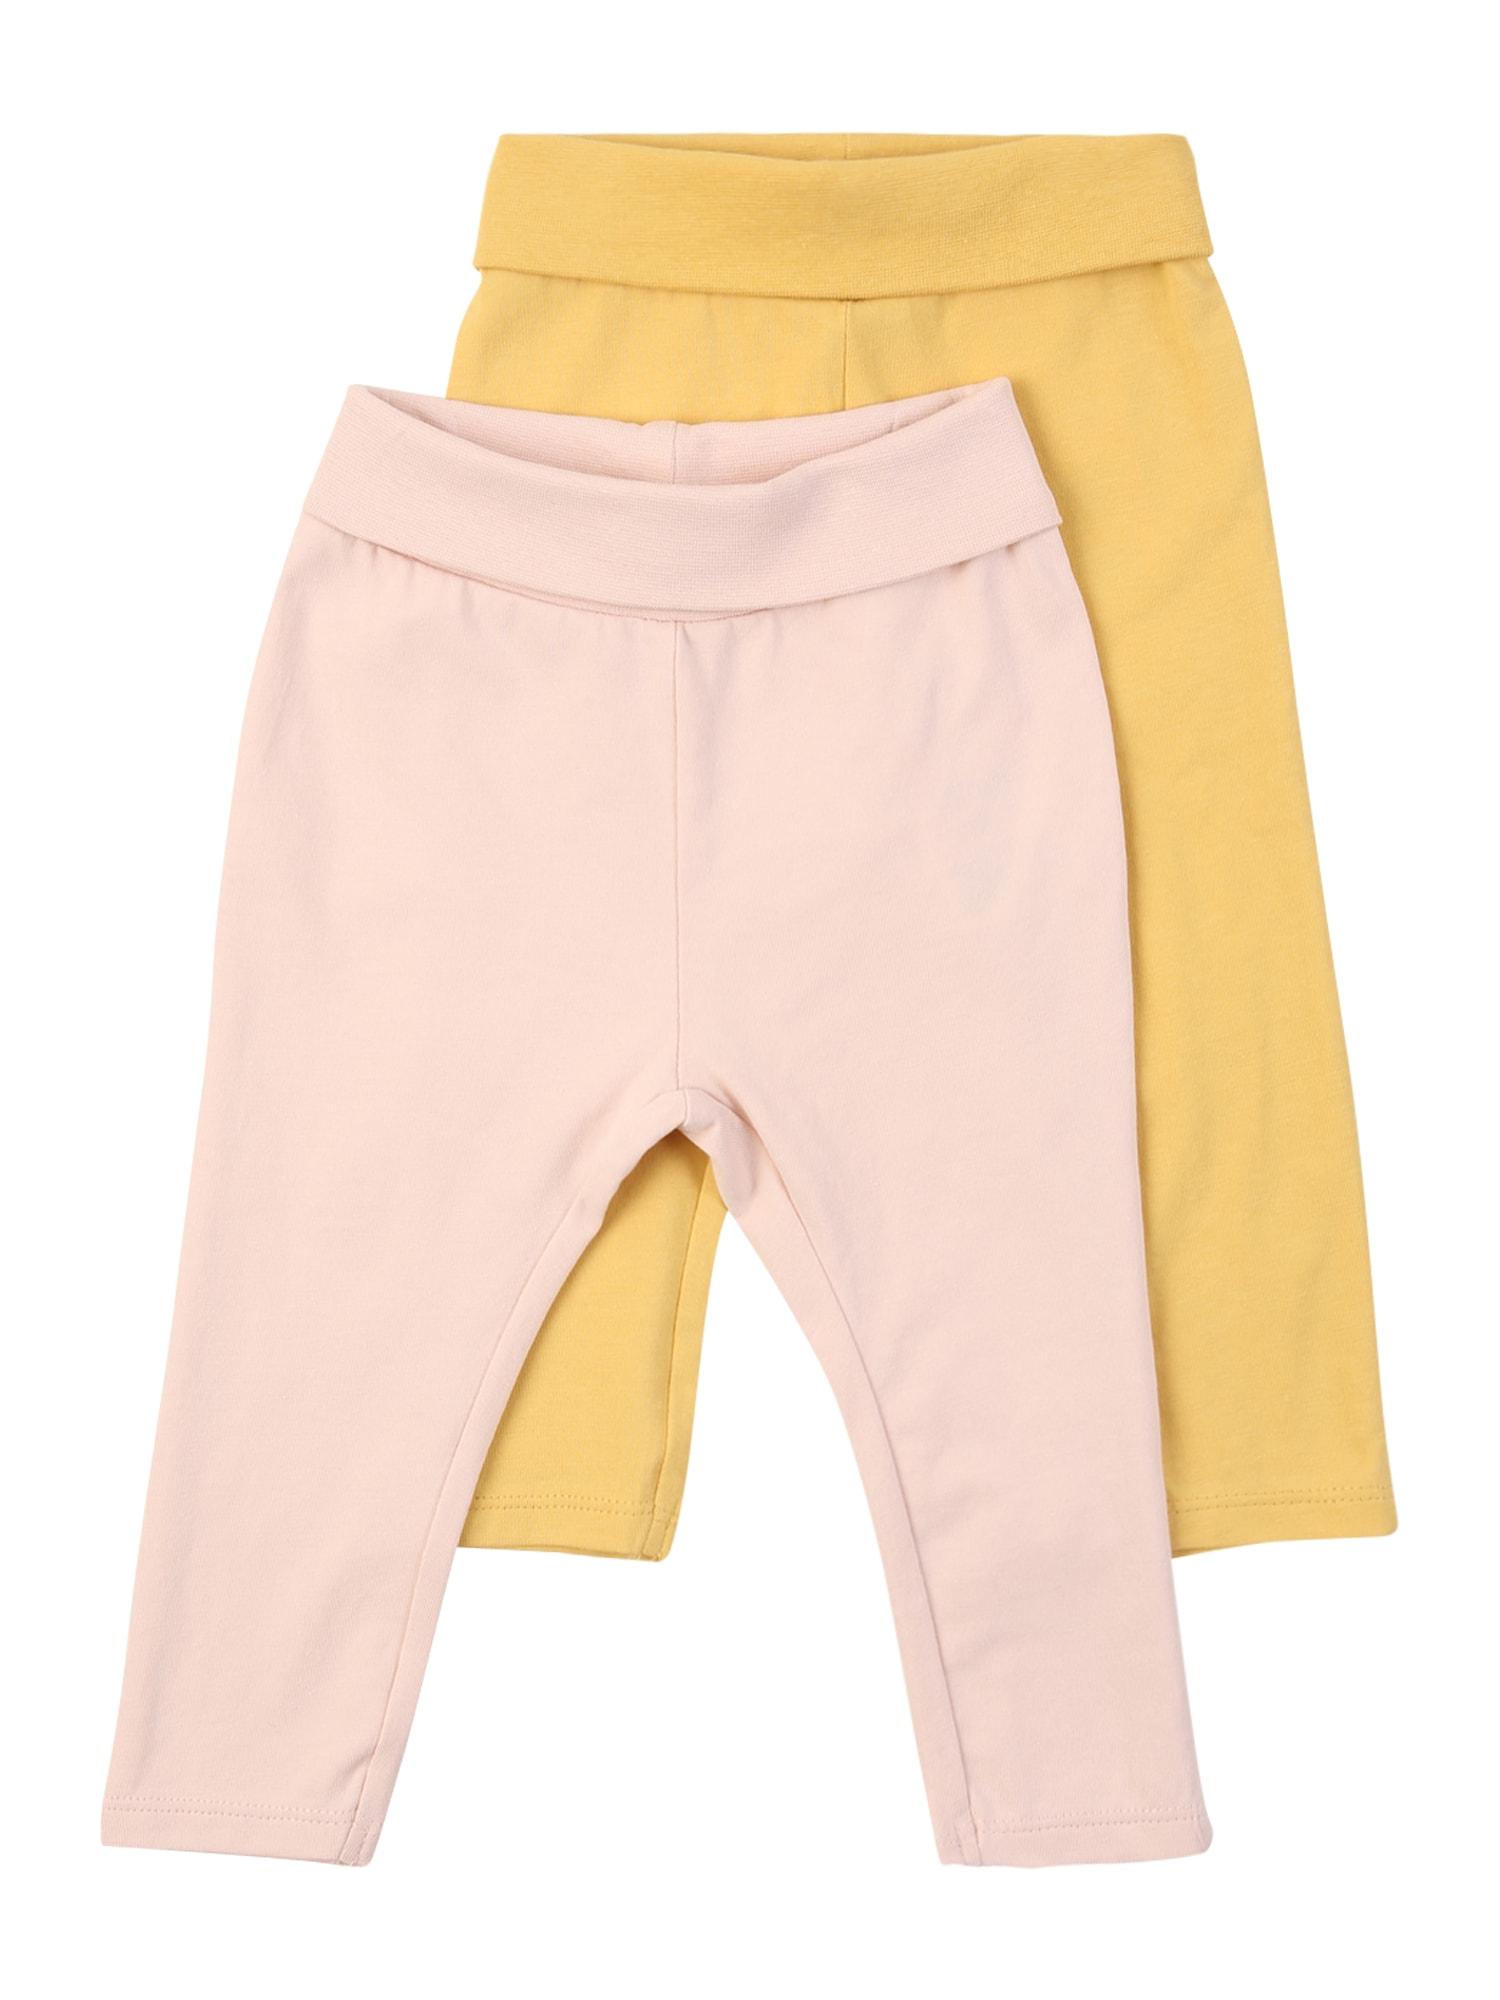 NAME IT Kelnės 'FRANSISKA' aukso geltonumo spalva / rožių spalva